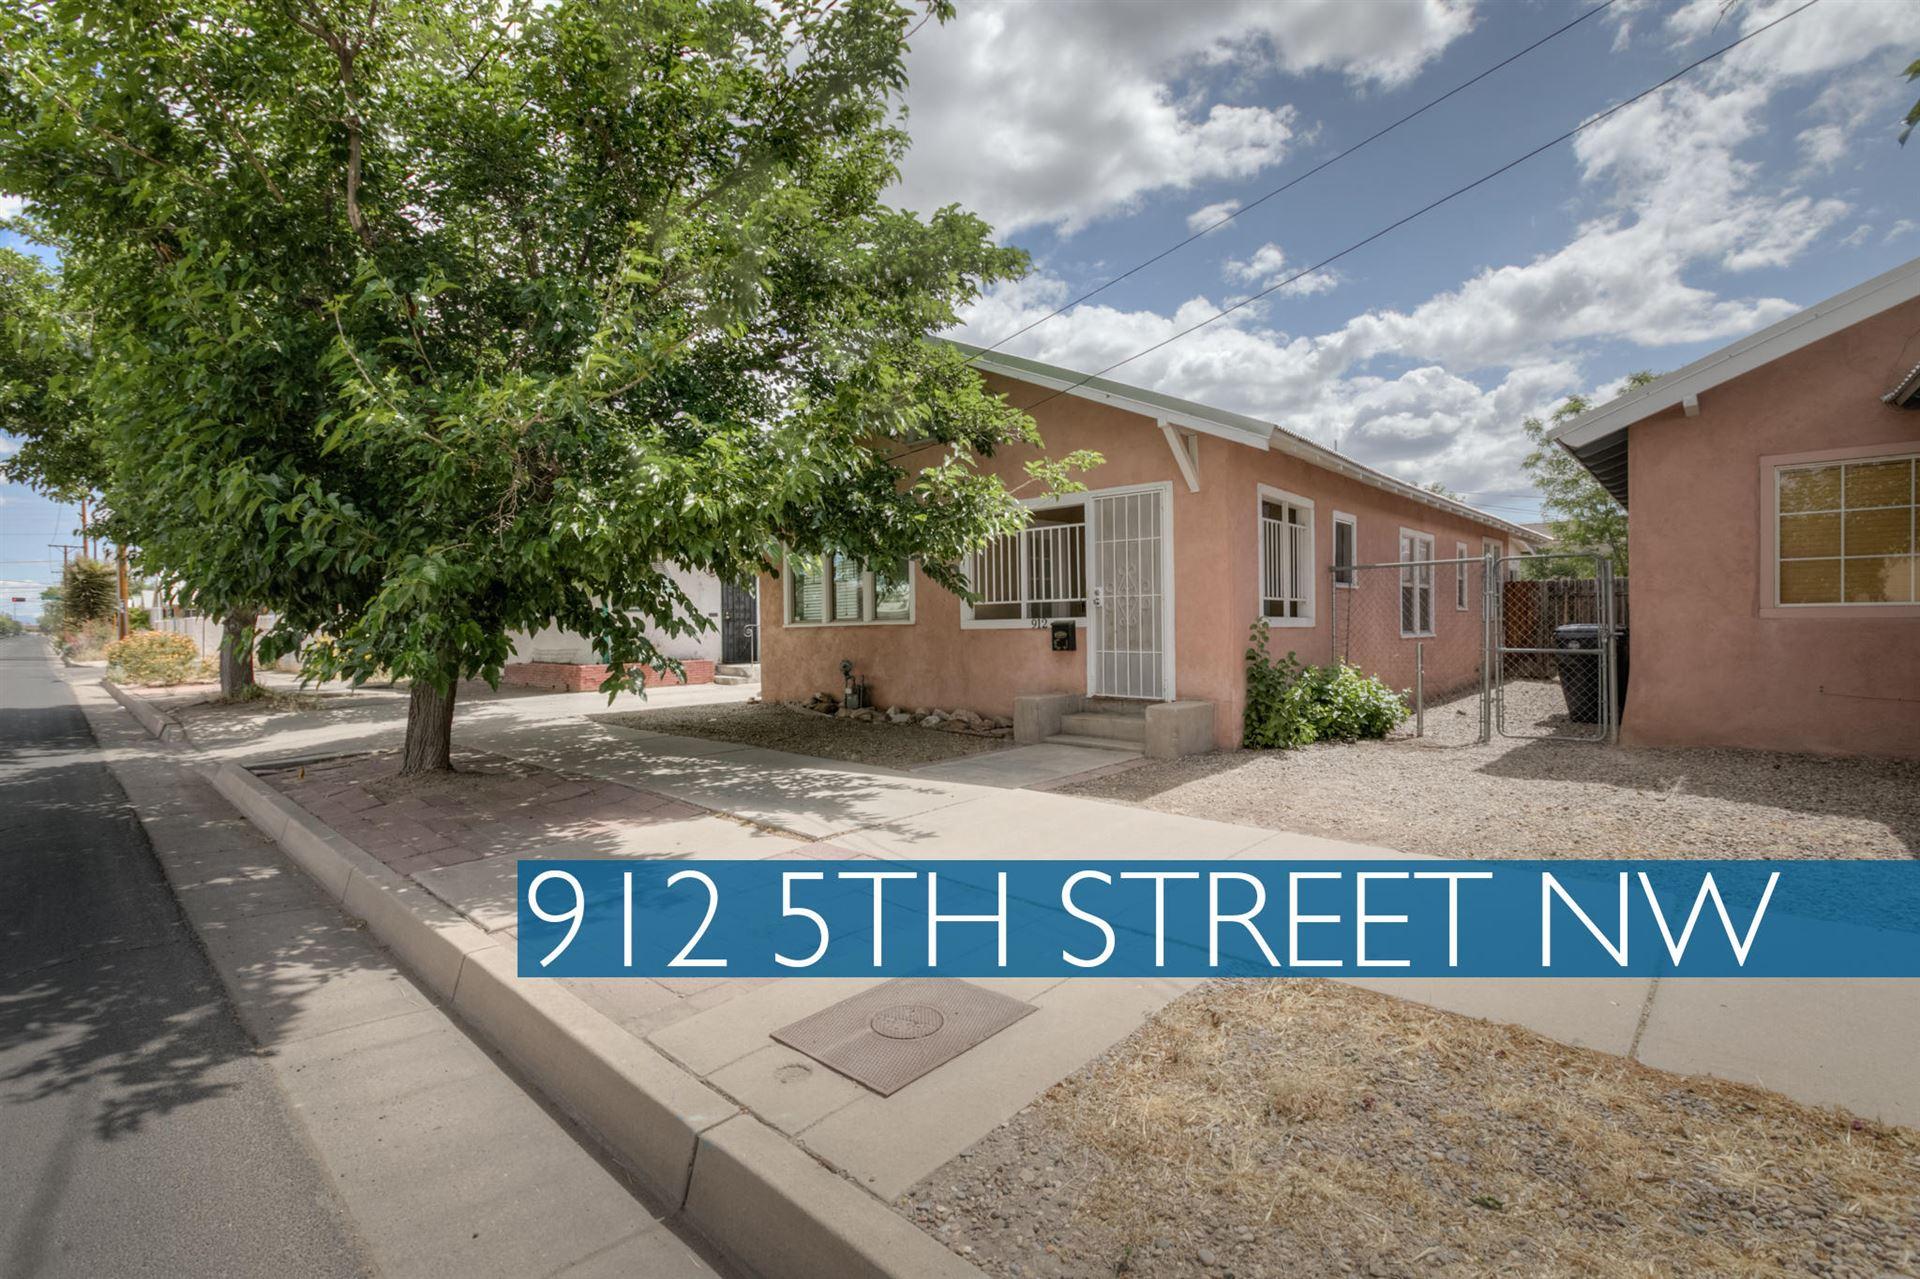 912 5th Street NW, Albuquerque, NM 87102 - #: 969042